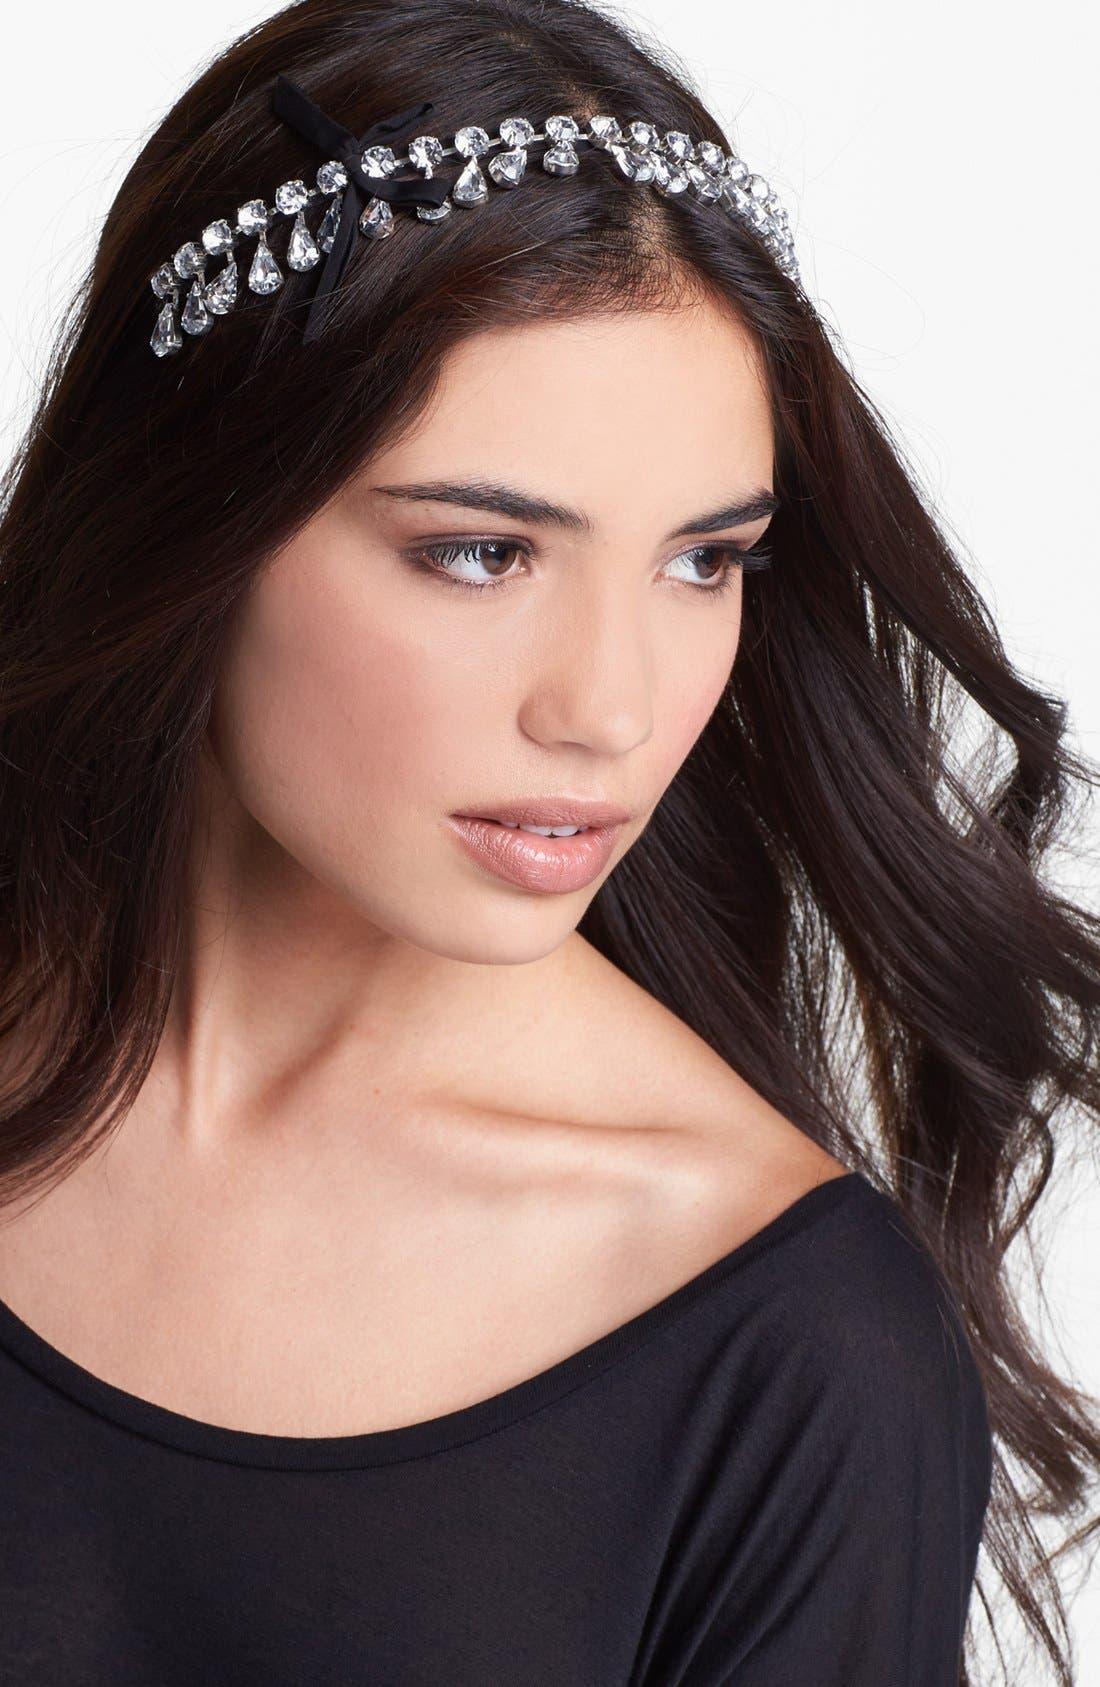 Alternate Image 1 Selected - Cara Teardrop Tiara Headband